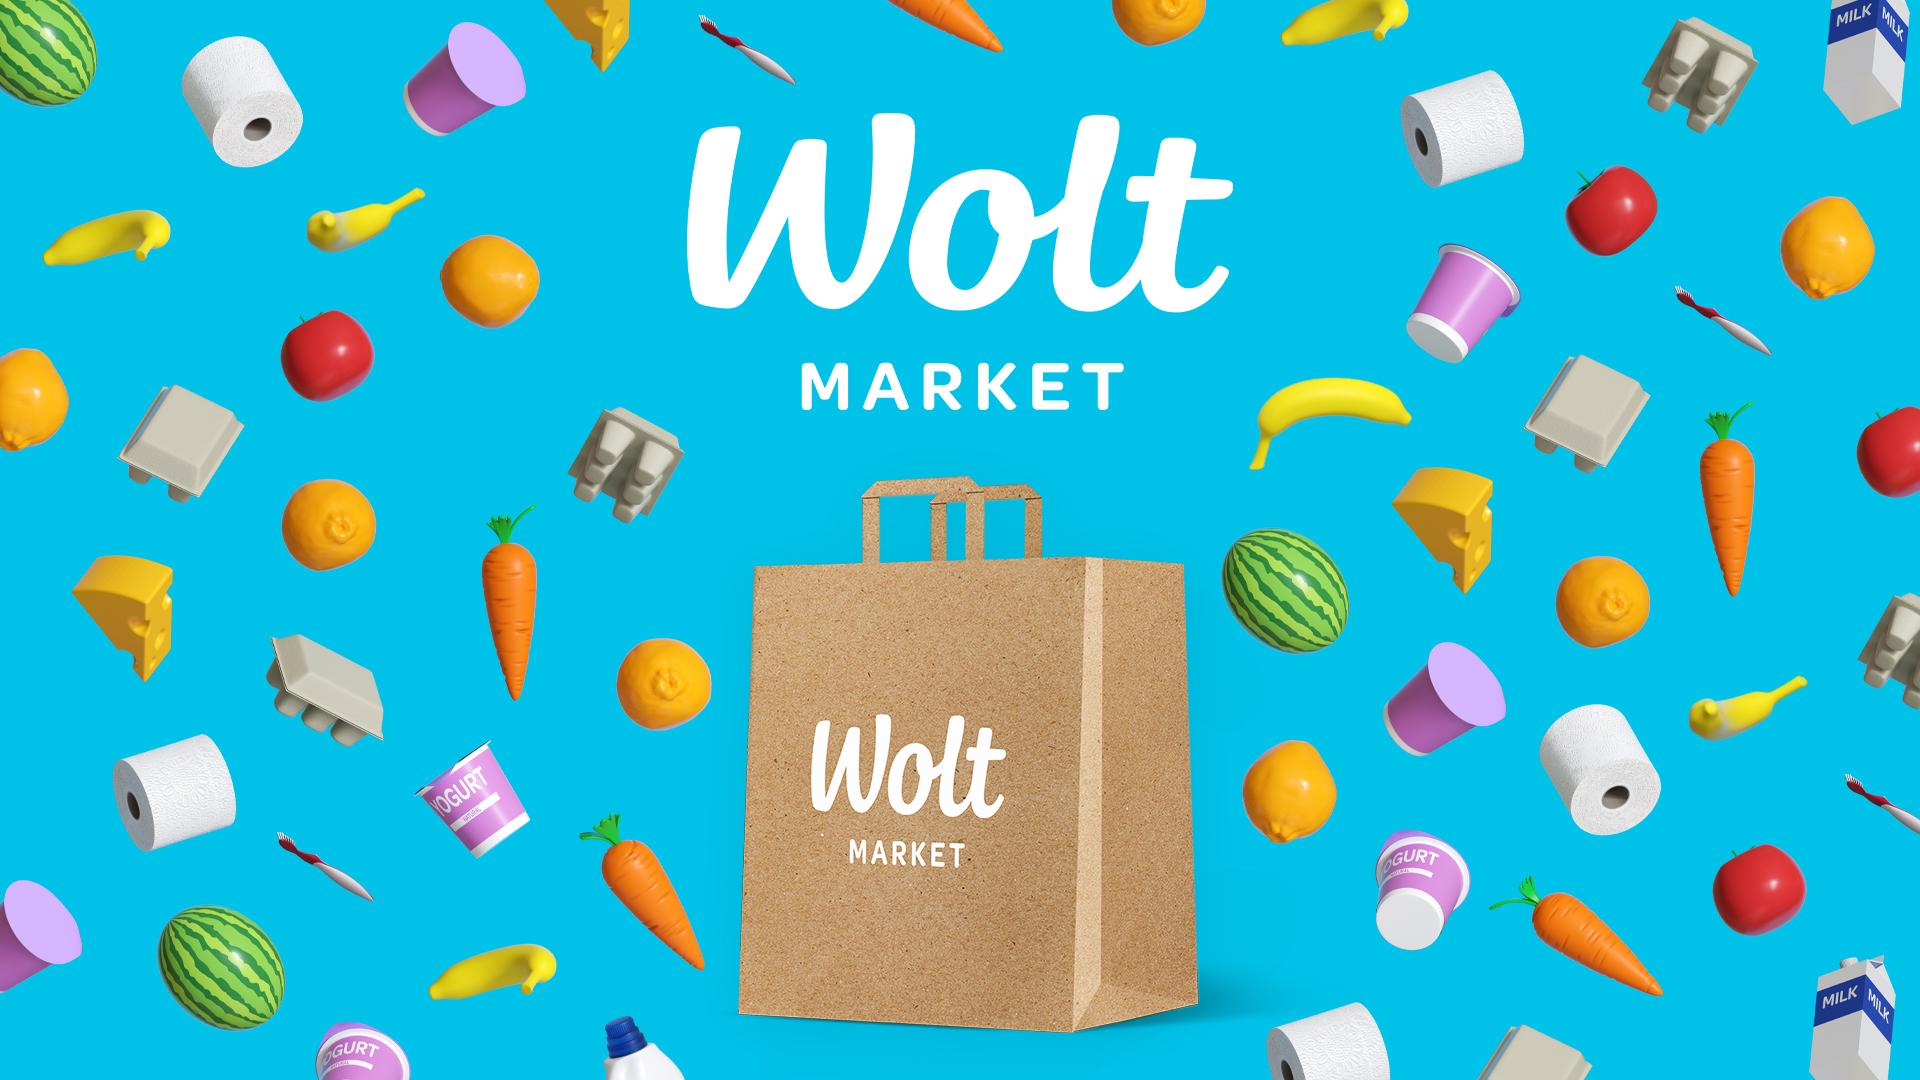 Wolt Market A